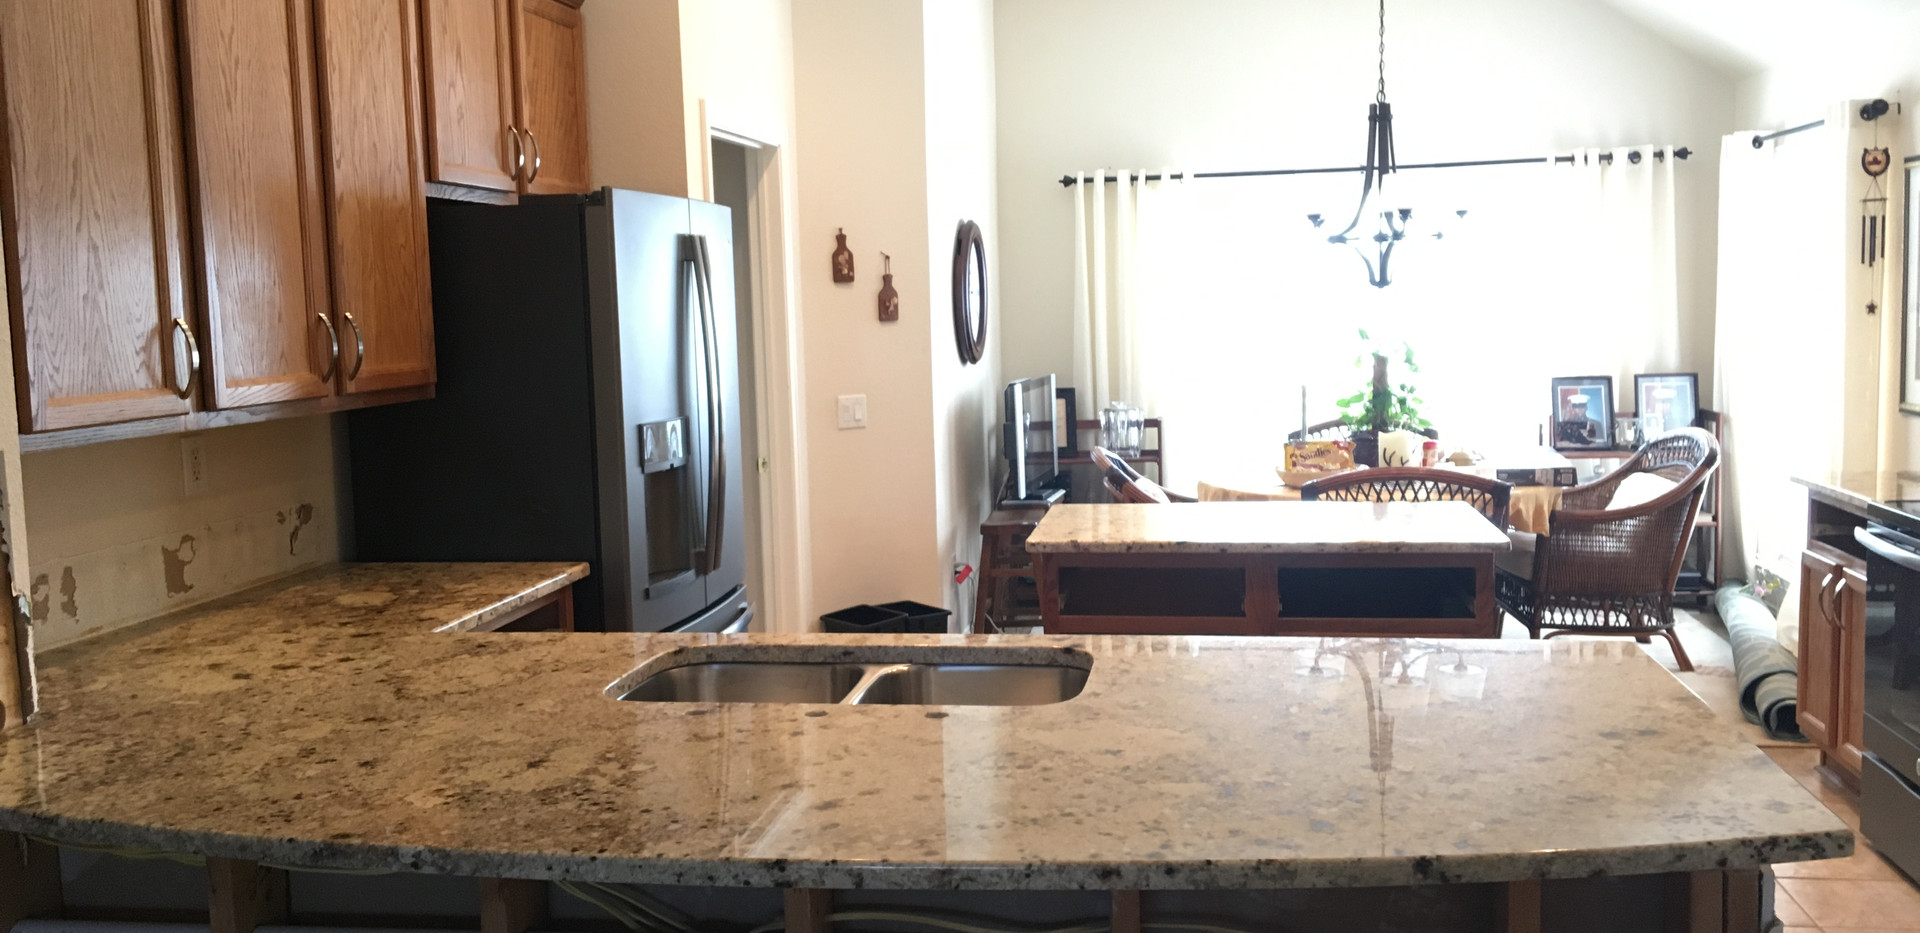 tan_granite_kitchen_countertop_sink.JPG